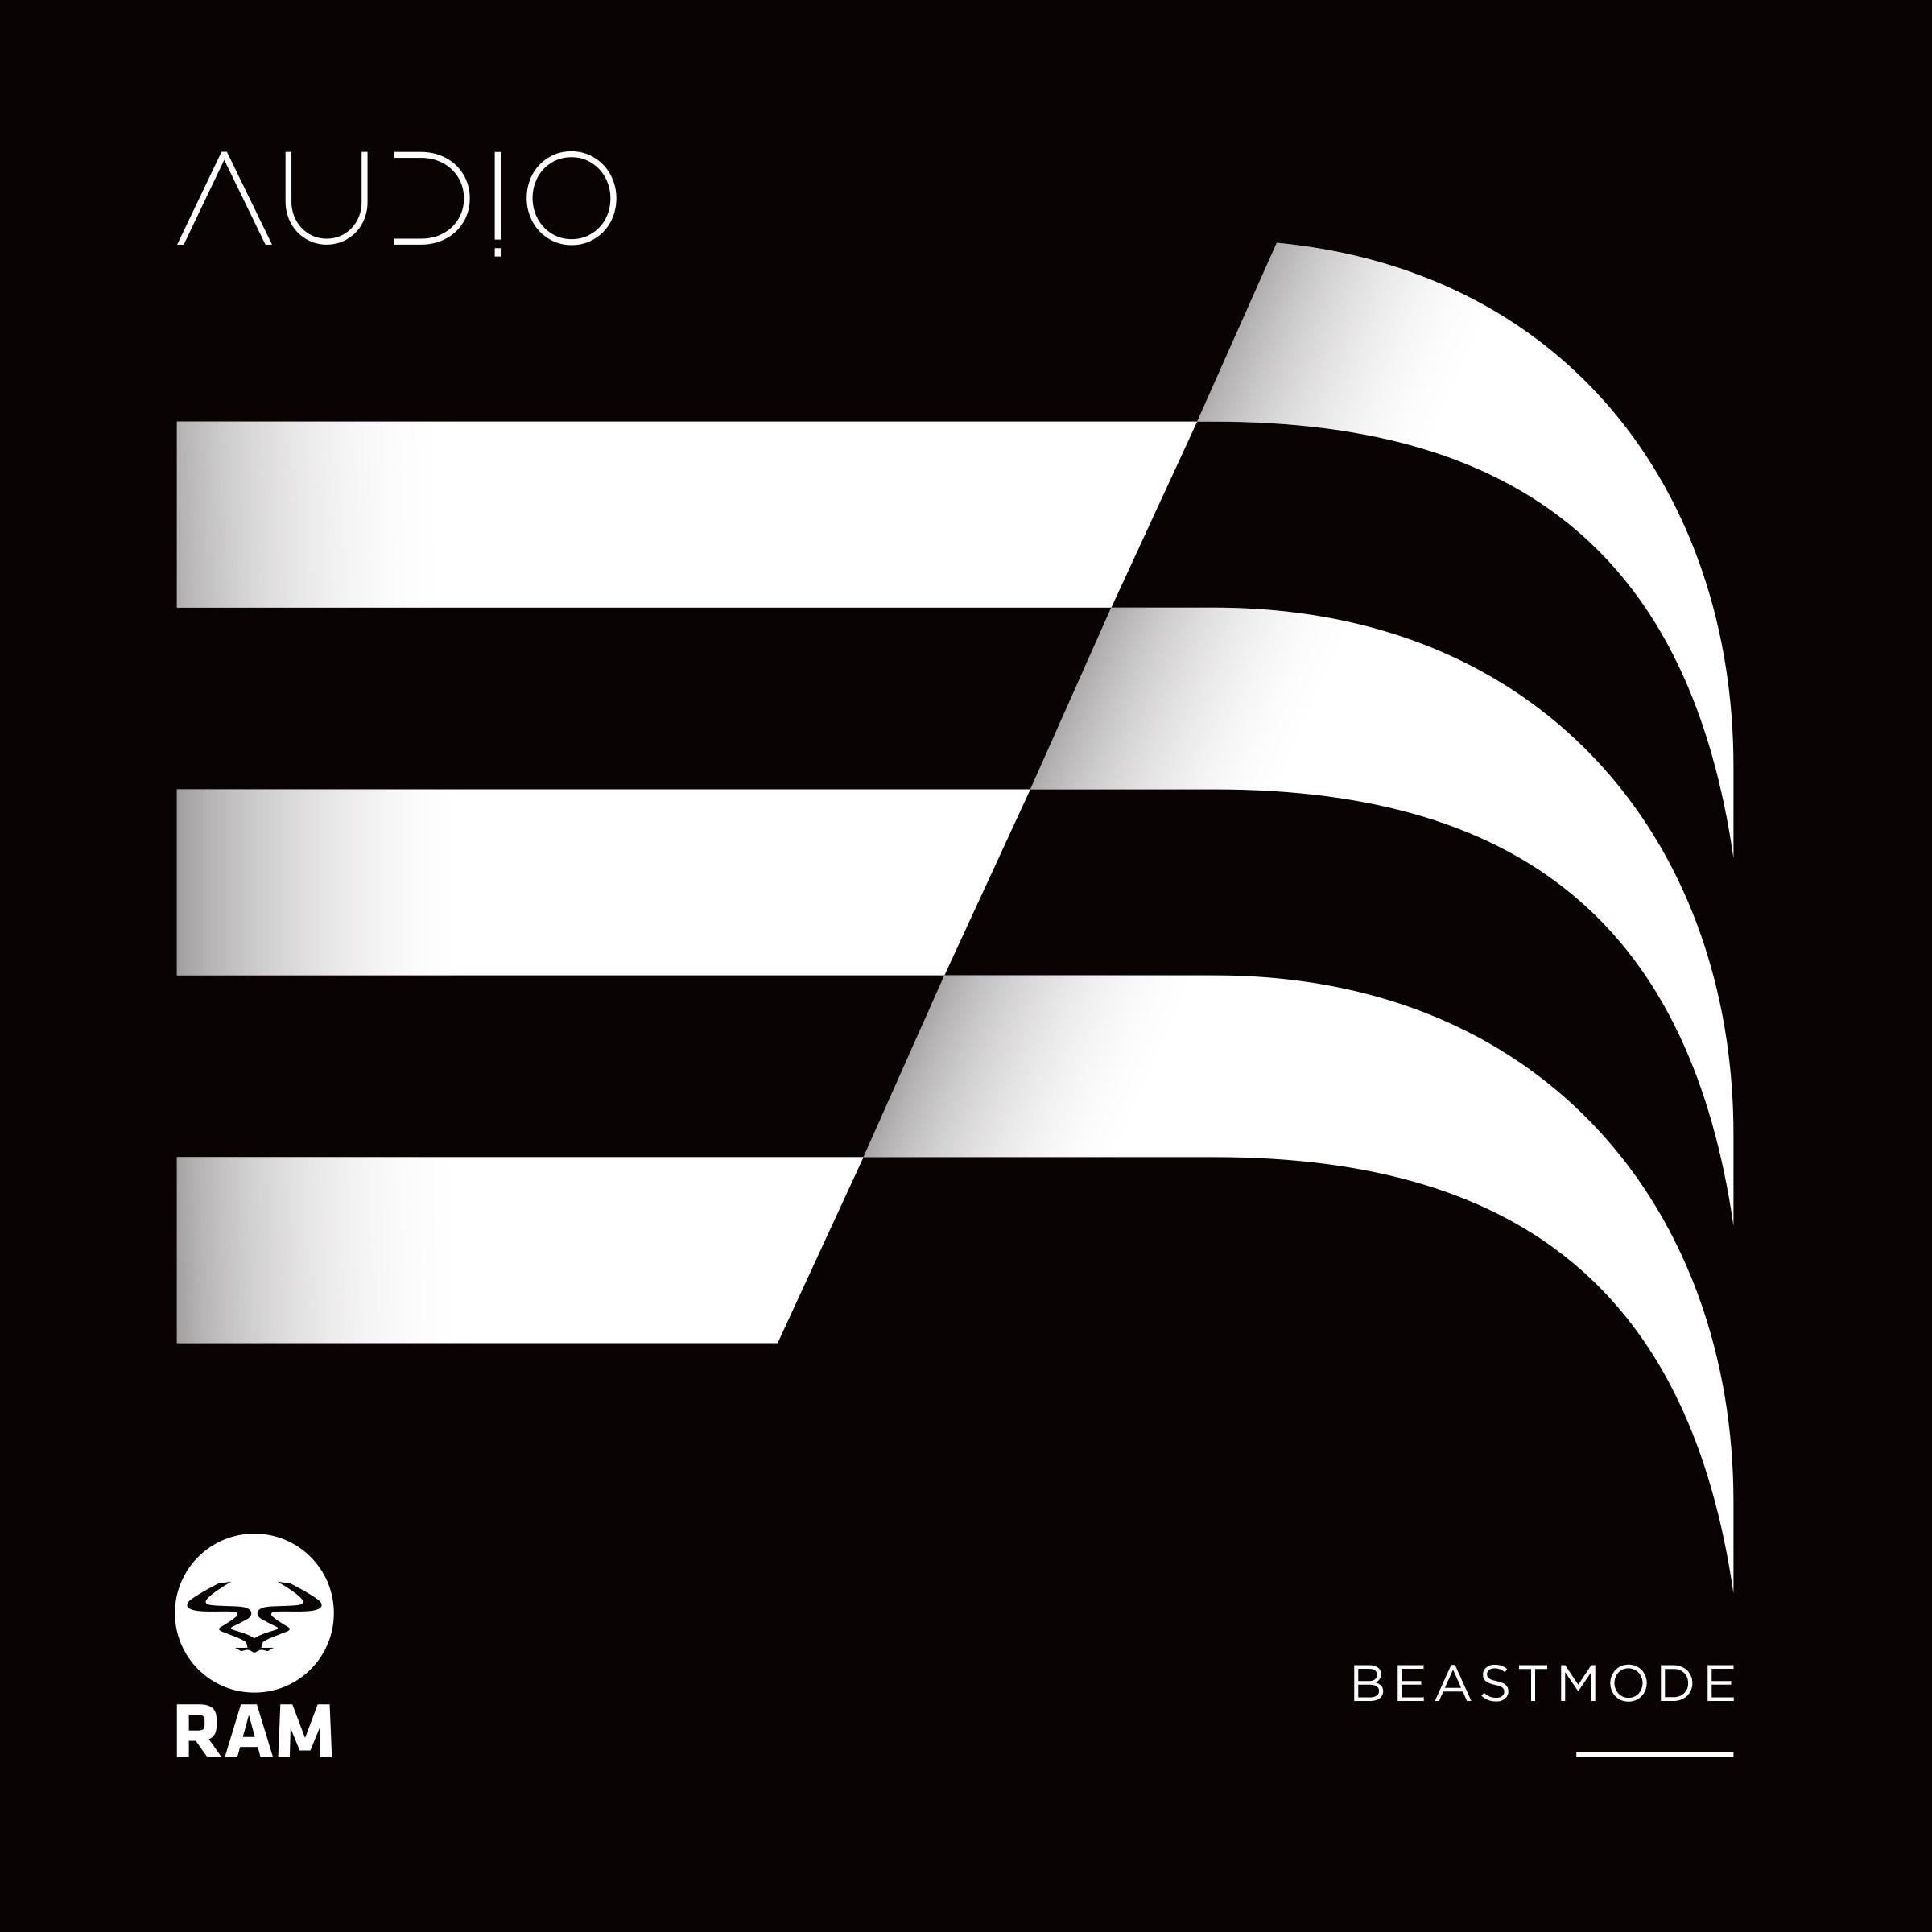 Audio/BEASTMODE CD